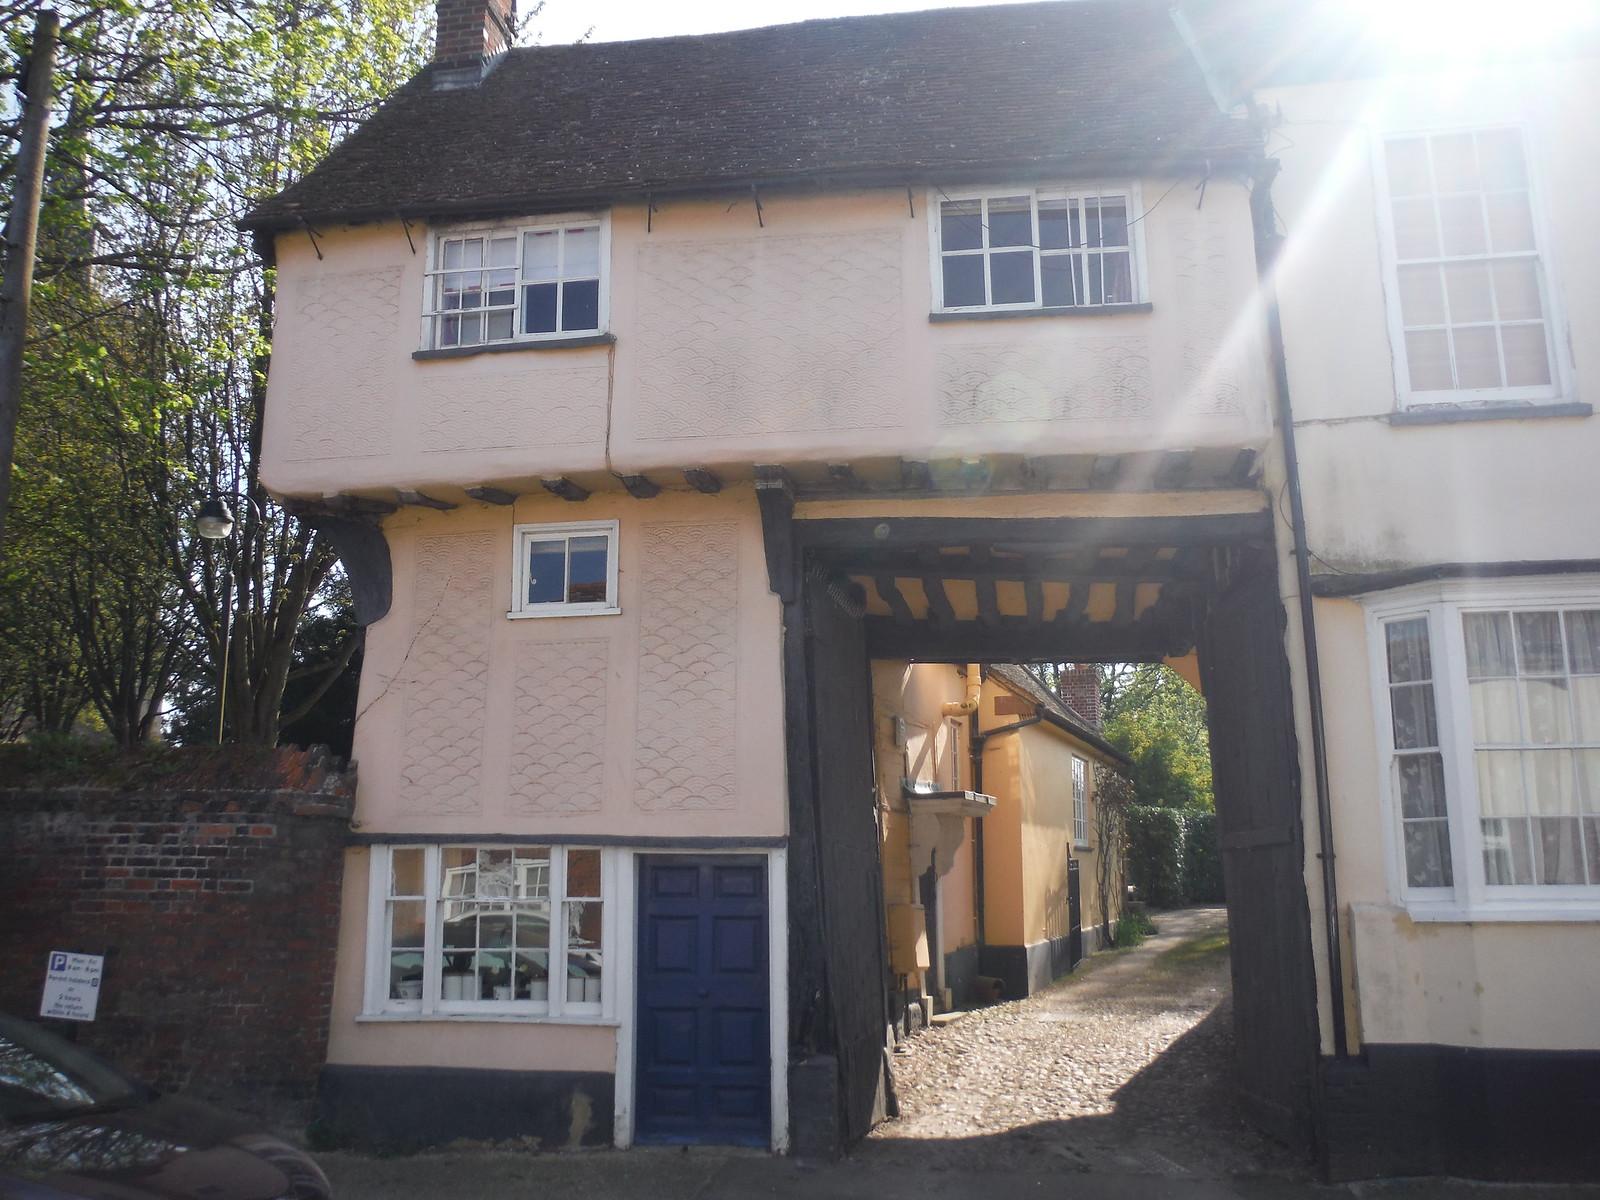 Pargetted House in Baldock SWC Walk 91 - Baldock Circular